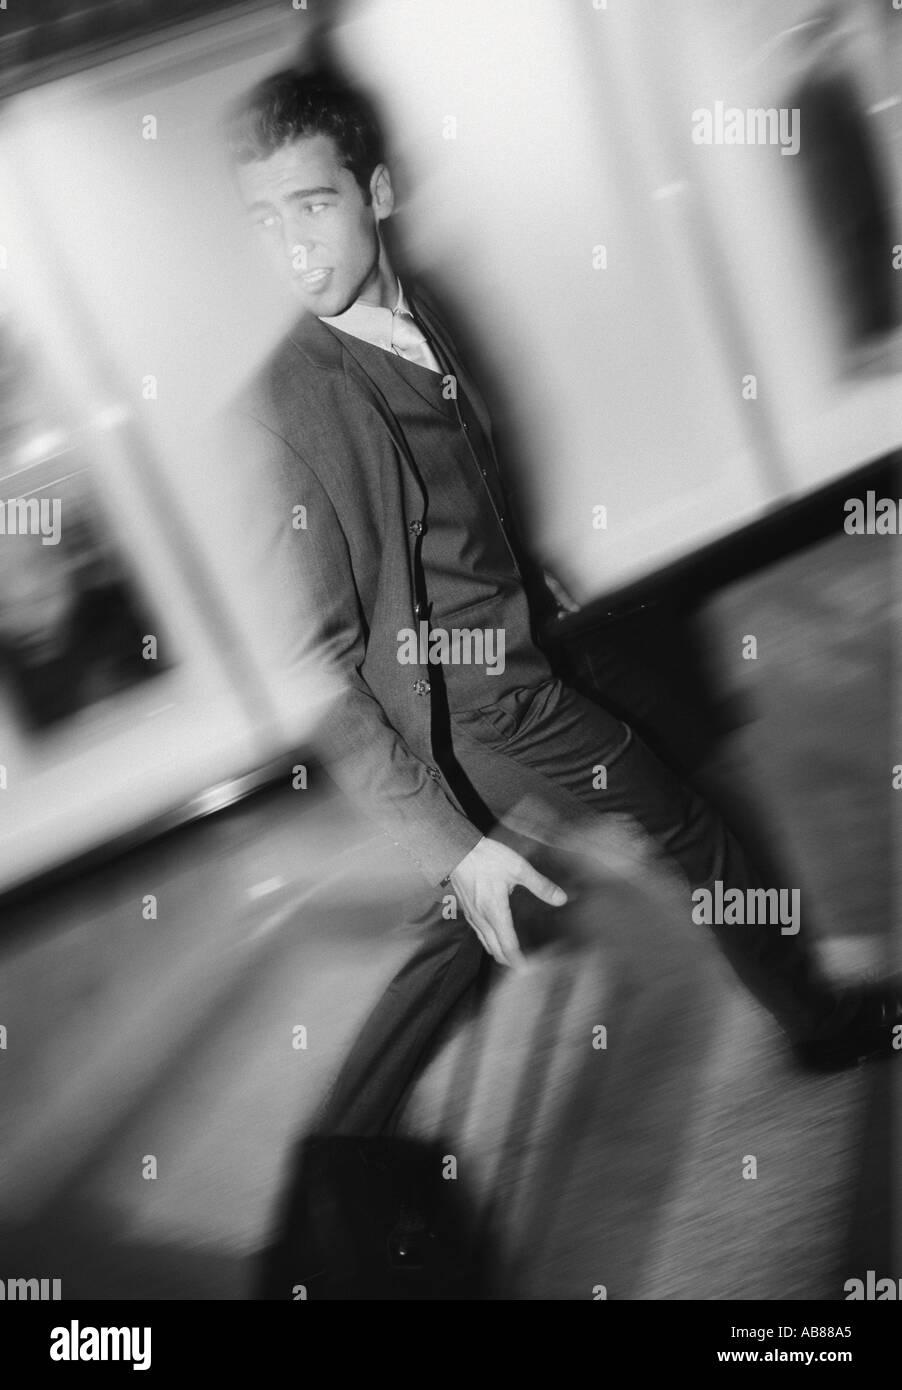 Businessman striding - Stock Image